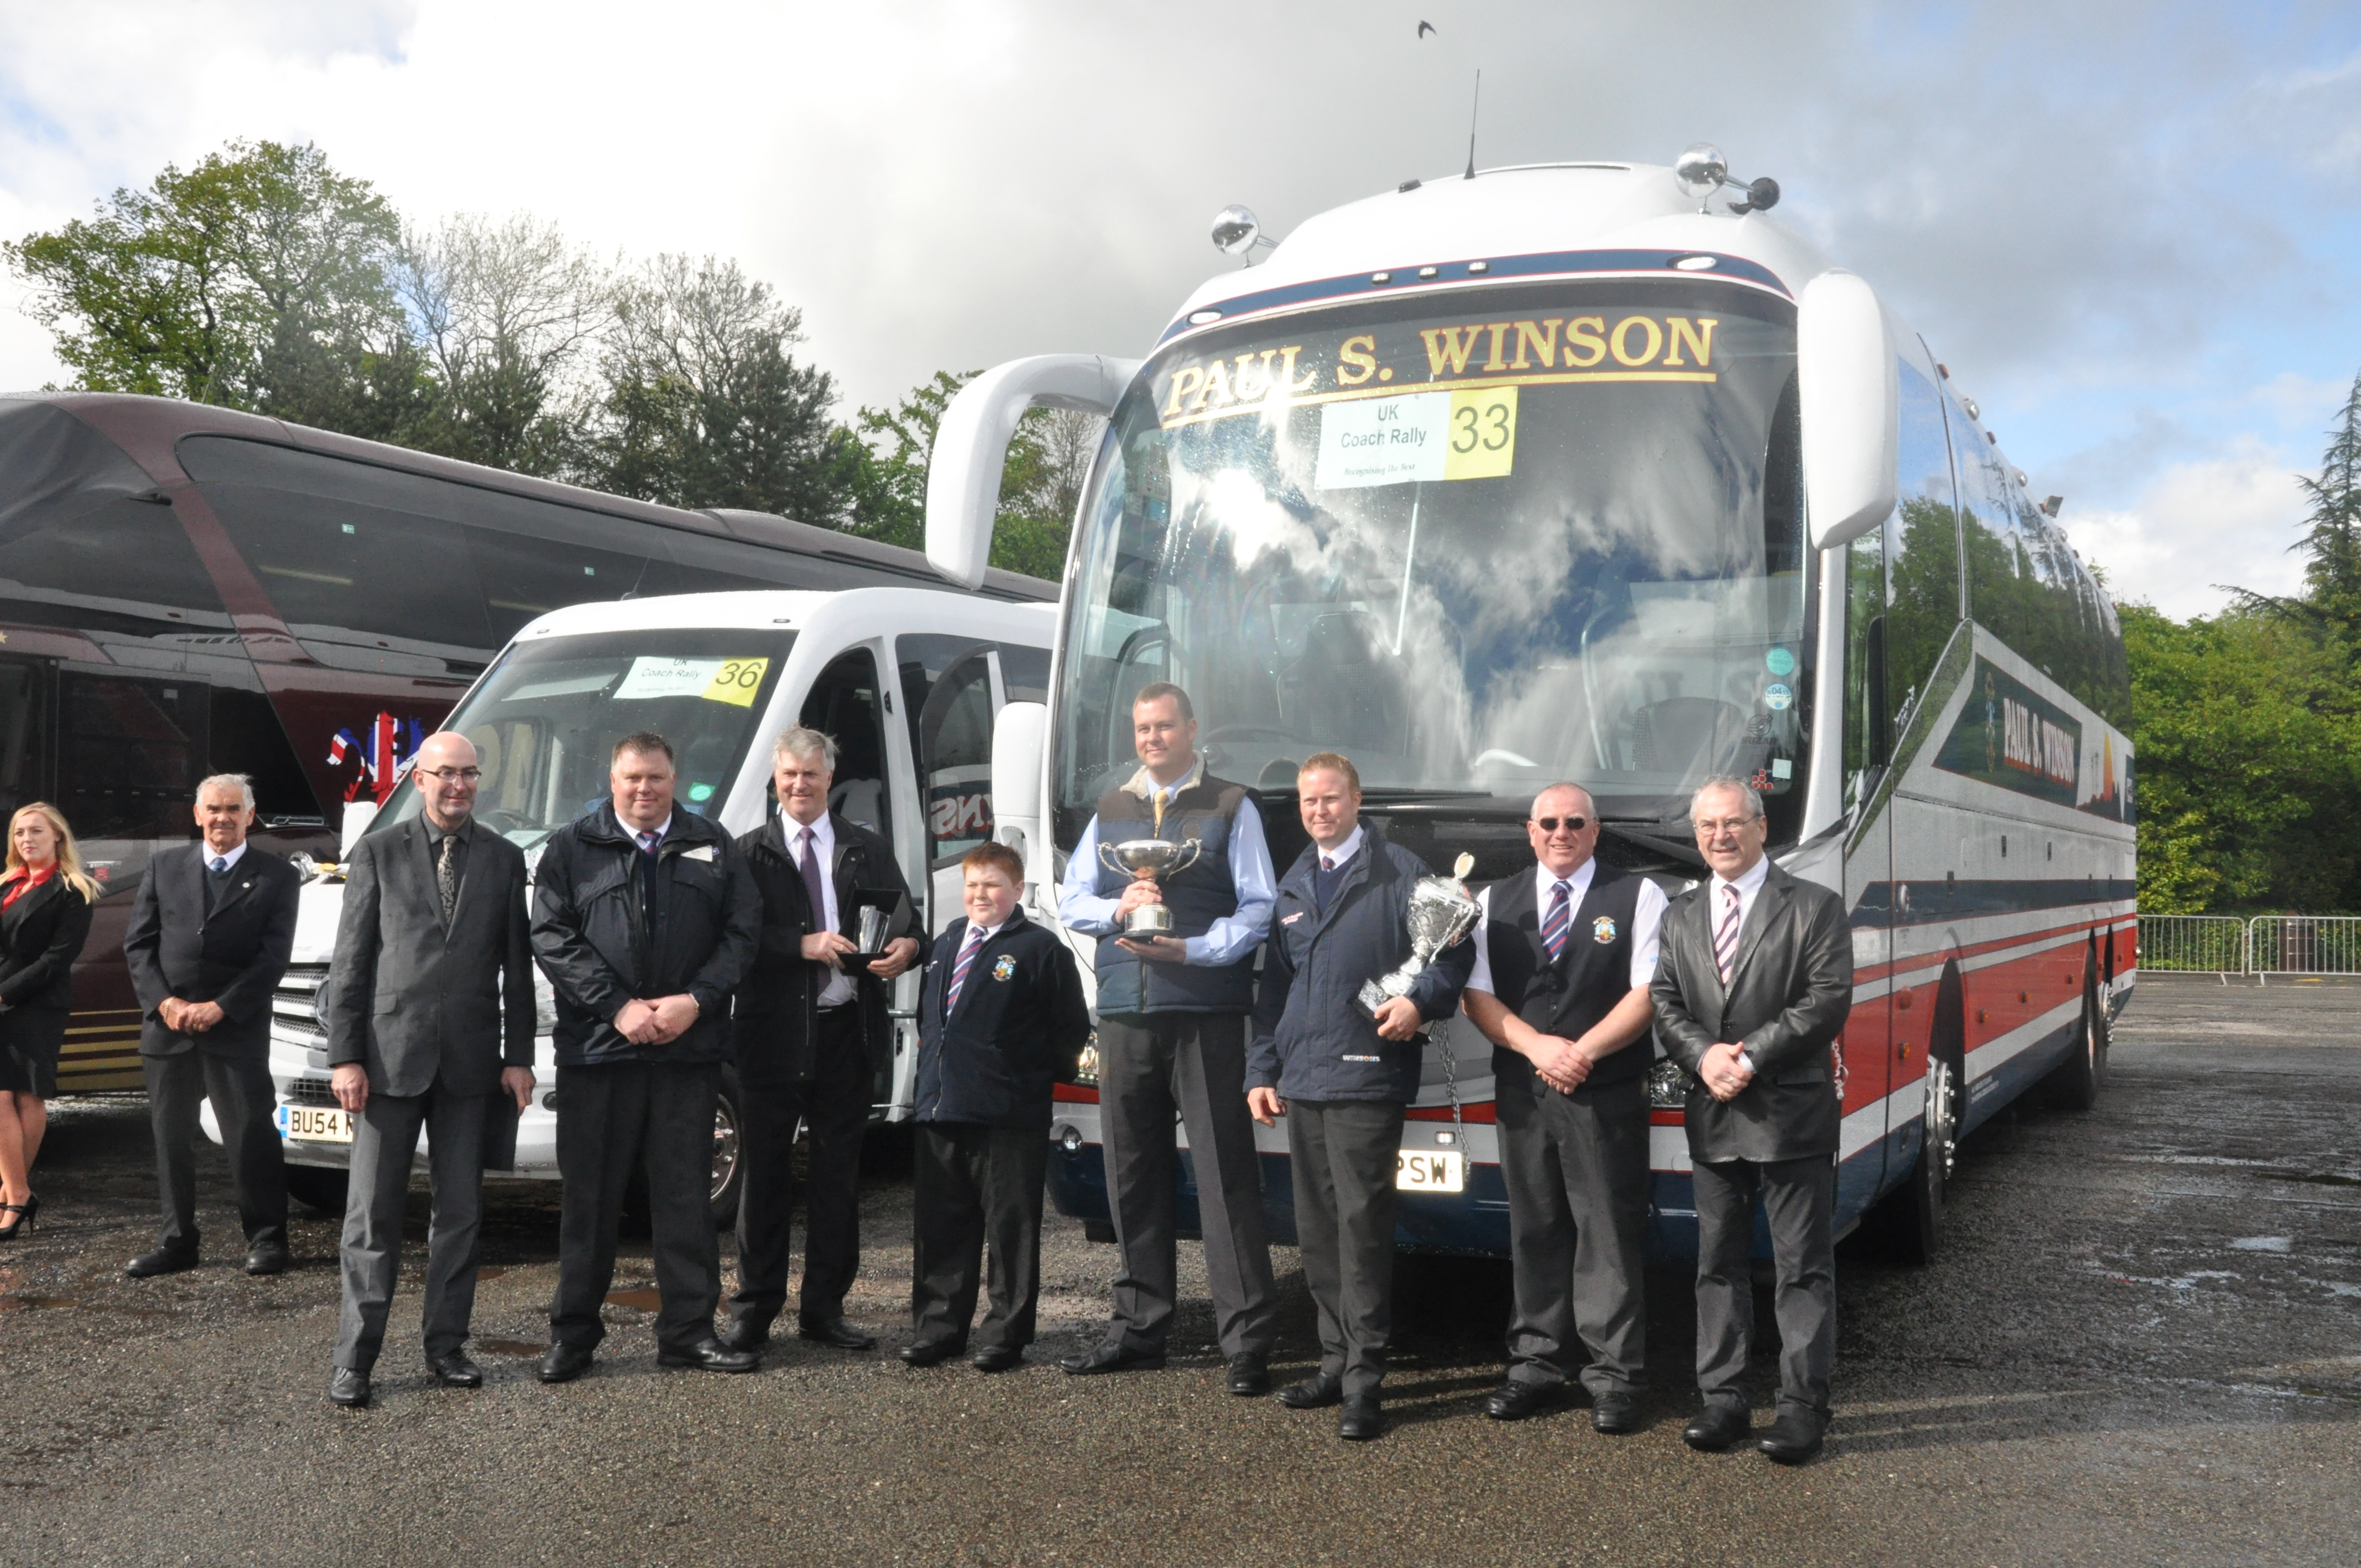 Paul S Winson (Coaches) Ltd